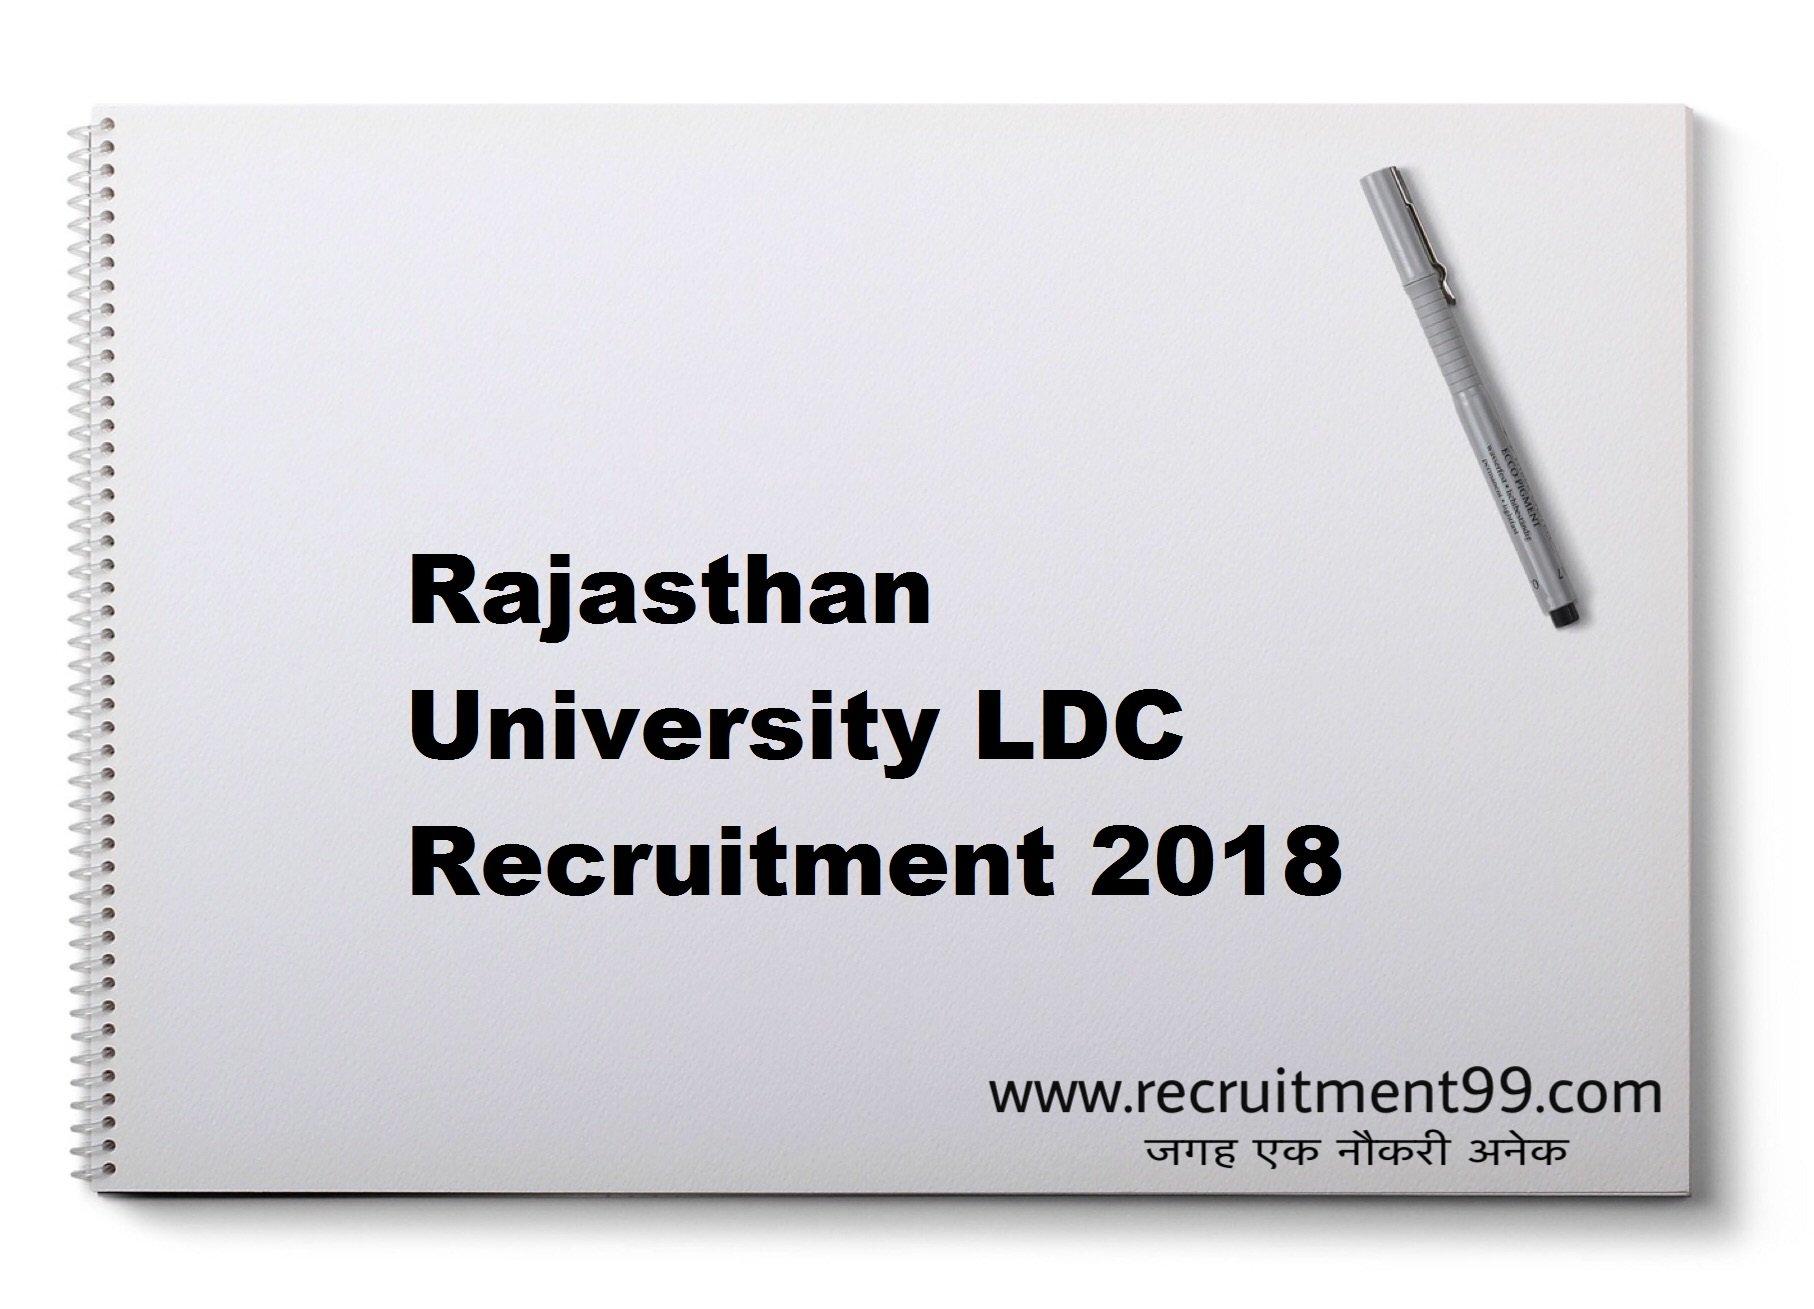 Rajasthan University LDC Recruitment Answer Key Result 2018